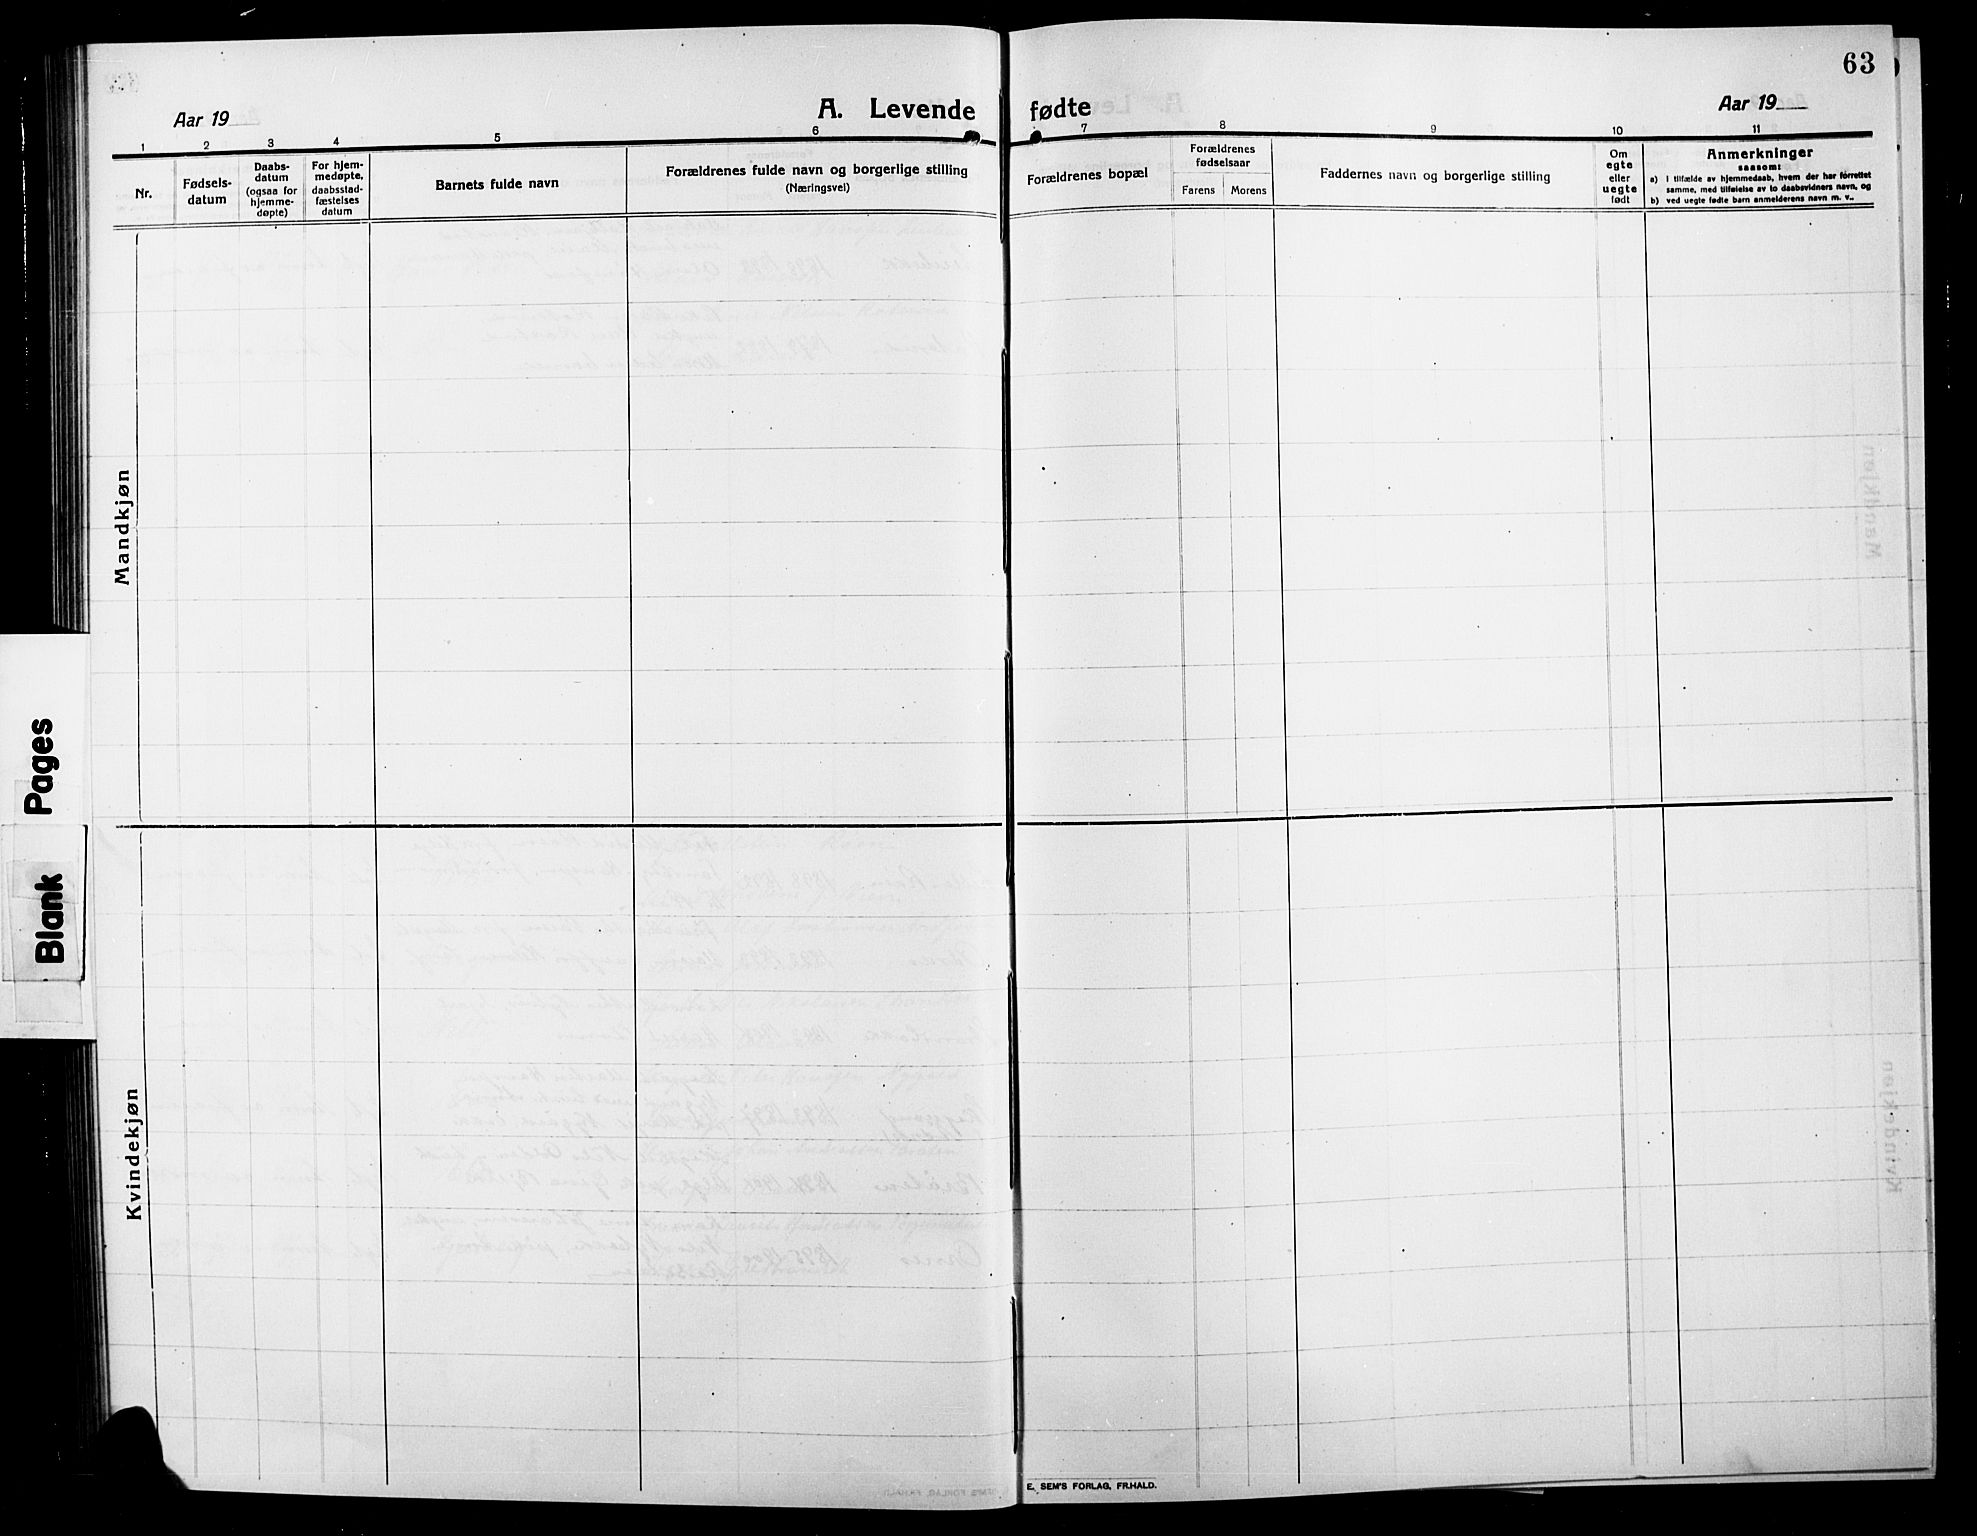 SAH, Søndre Land prestekontor, L/L0006: Klokkerbok nr. 6, 1912-1925, s. 63